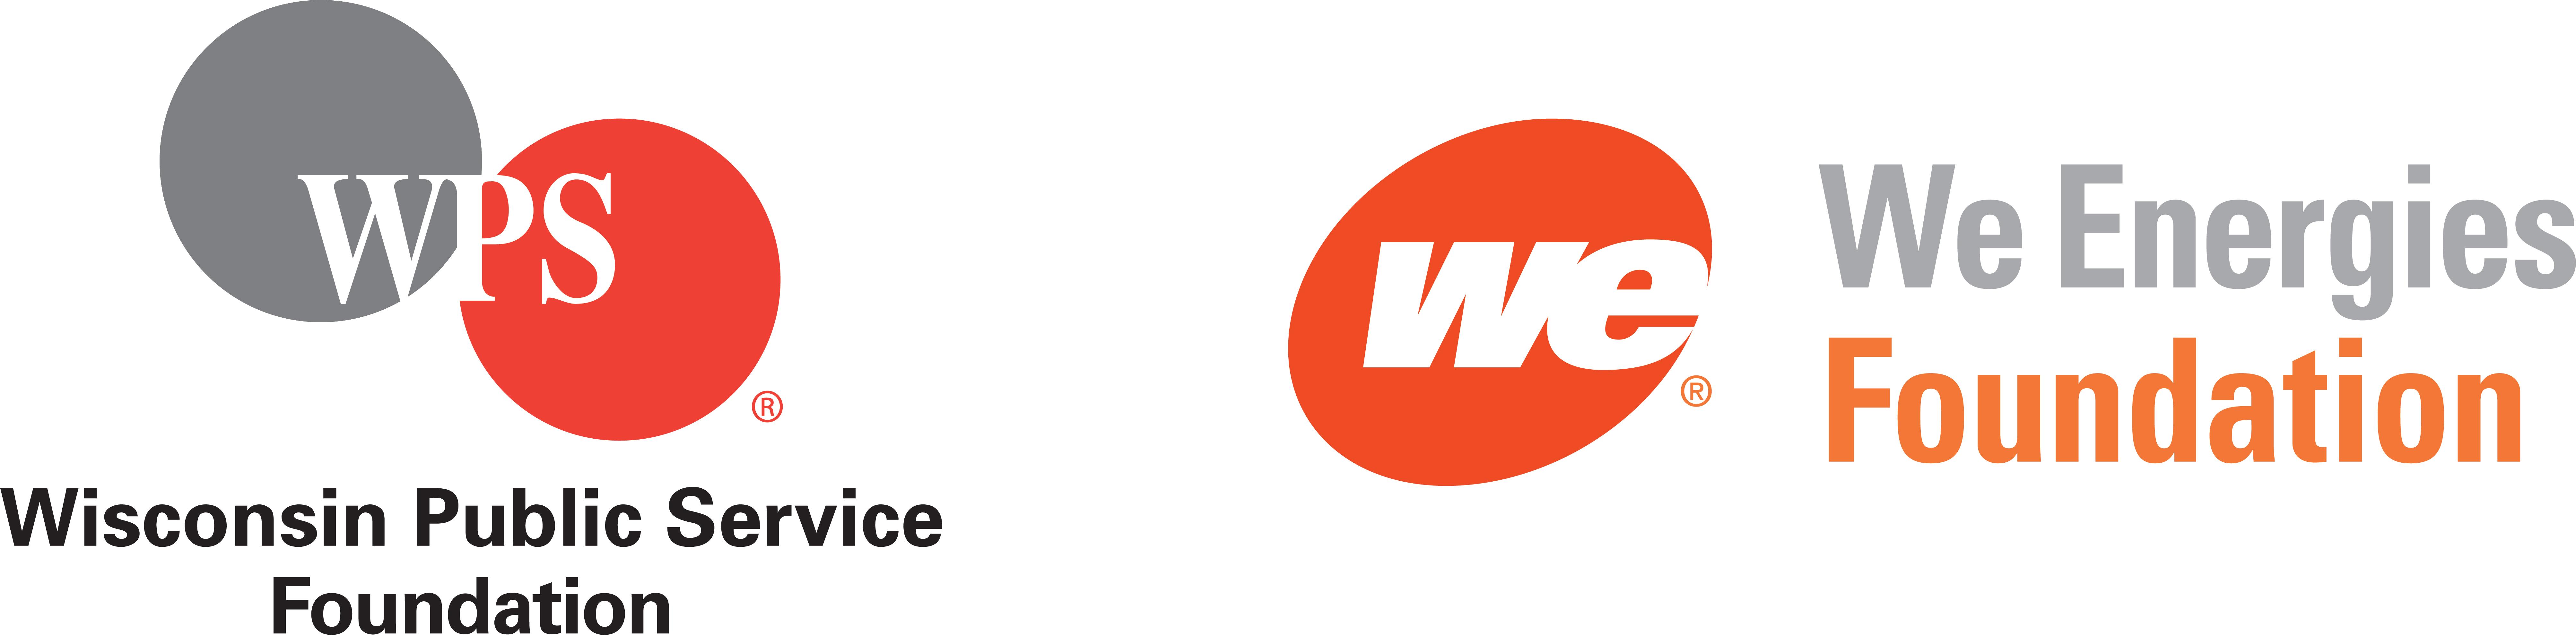 WPS Foundation, We Energies Foundation logo